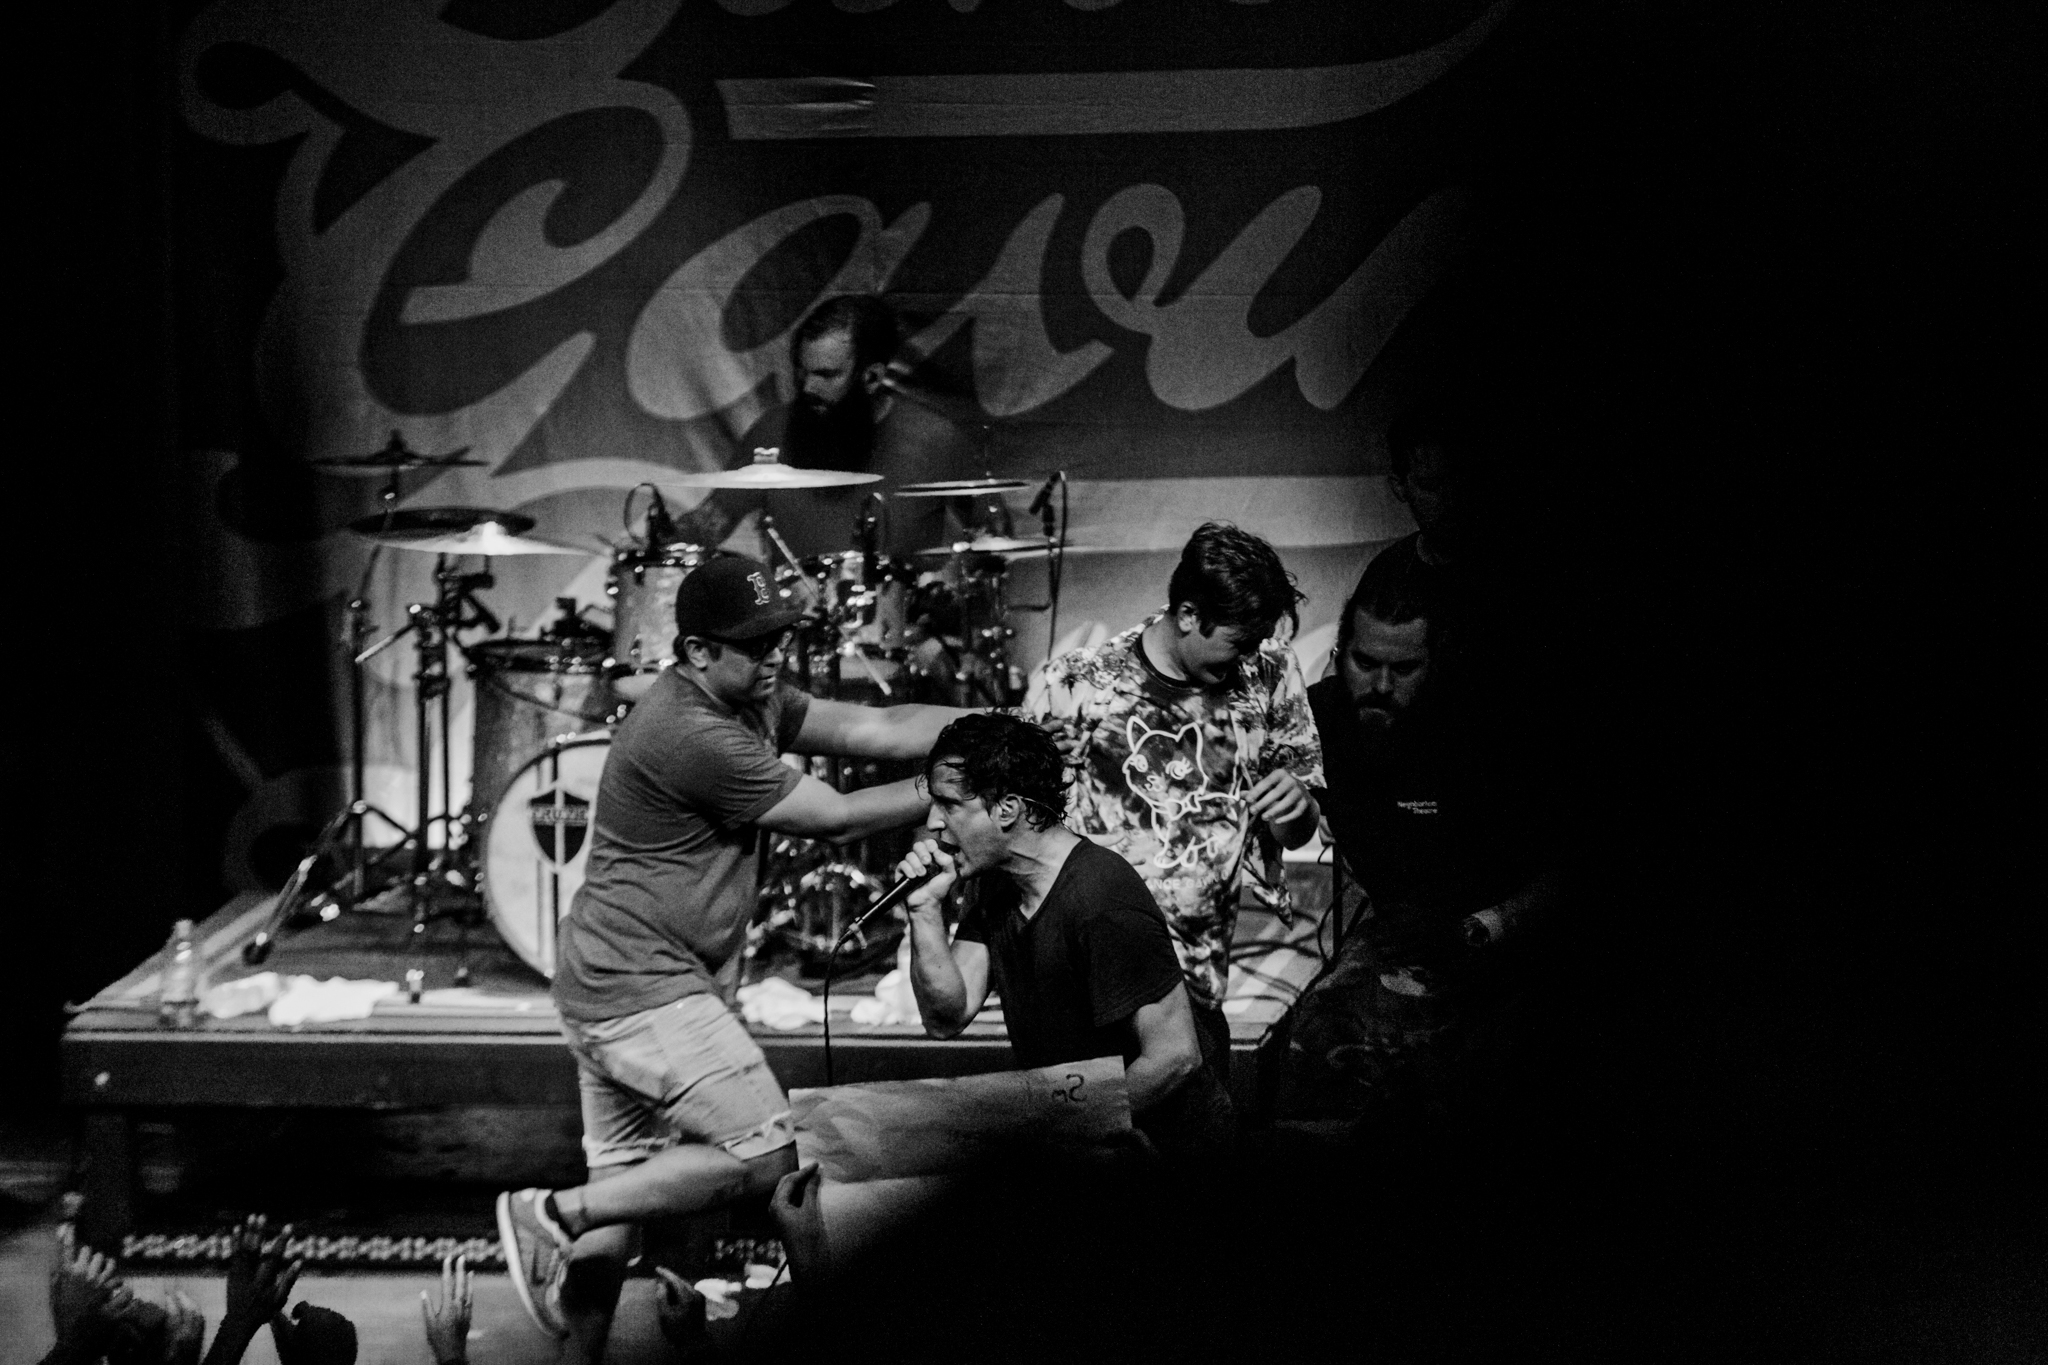 Lafferty Photo - Dance Gavin Dance 03.08.17-8756.jpg